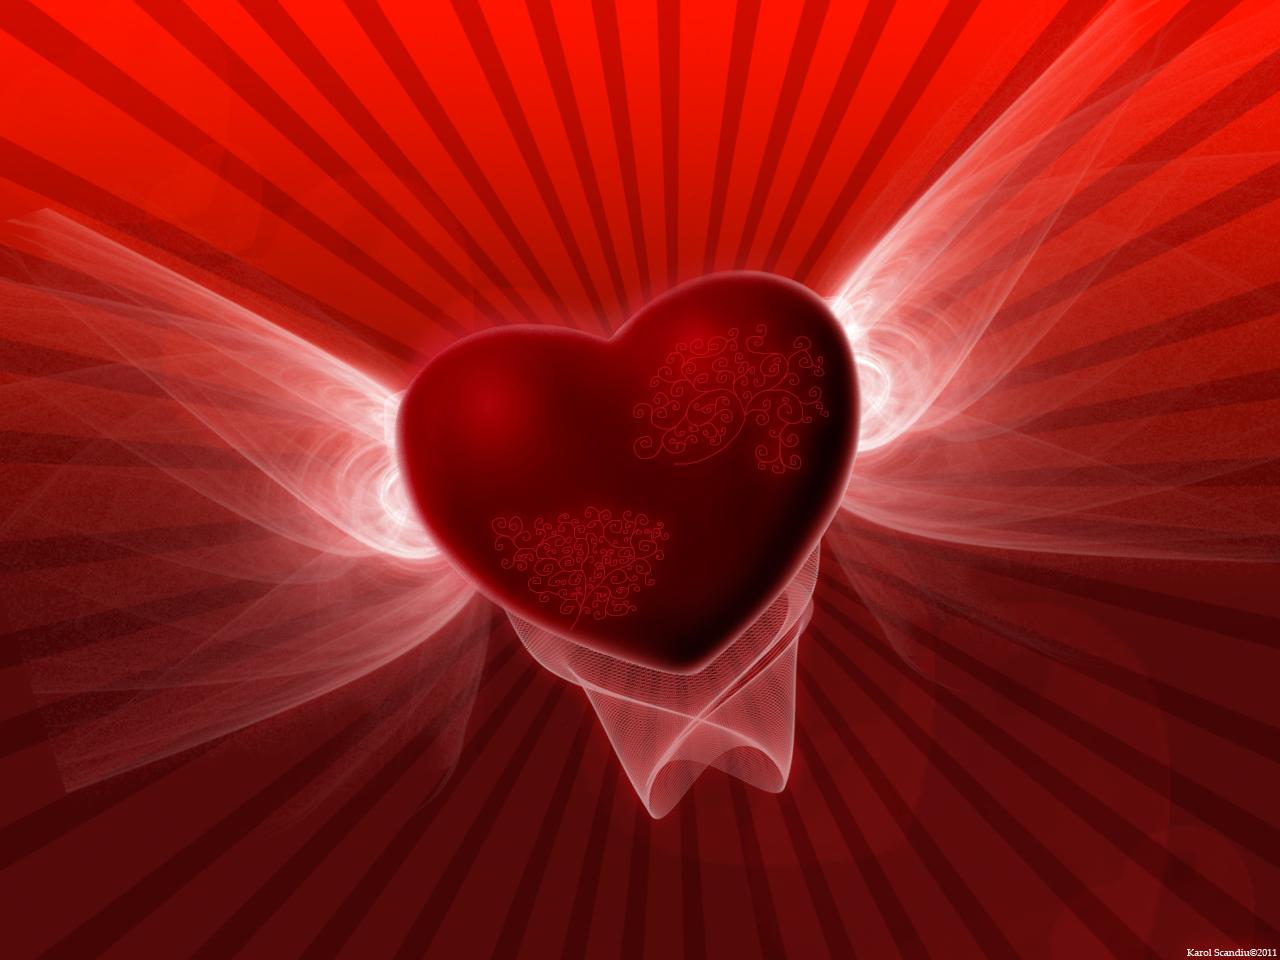 http://1.bp.blogspot.com/-ukveWFEdxEo/TViEx8raNBI/AAAAAAAACcs/moXFa_mzCZQ/s1600/WallPaperCorazon.jpg